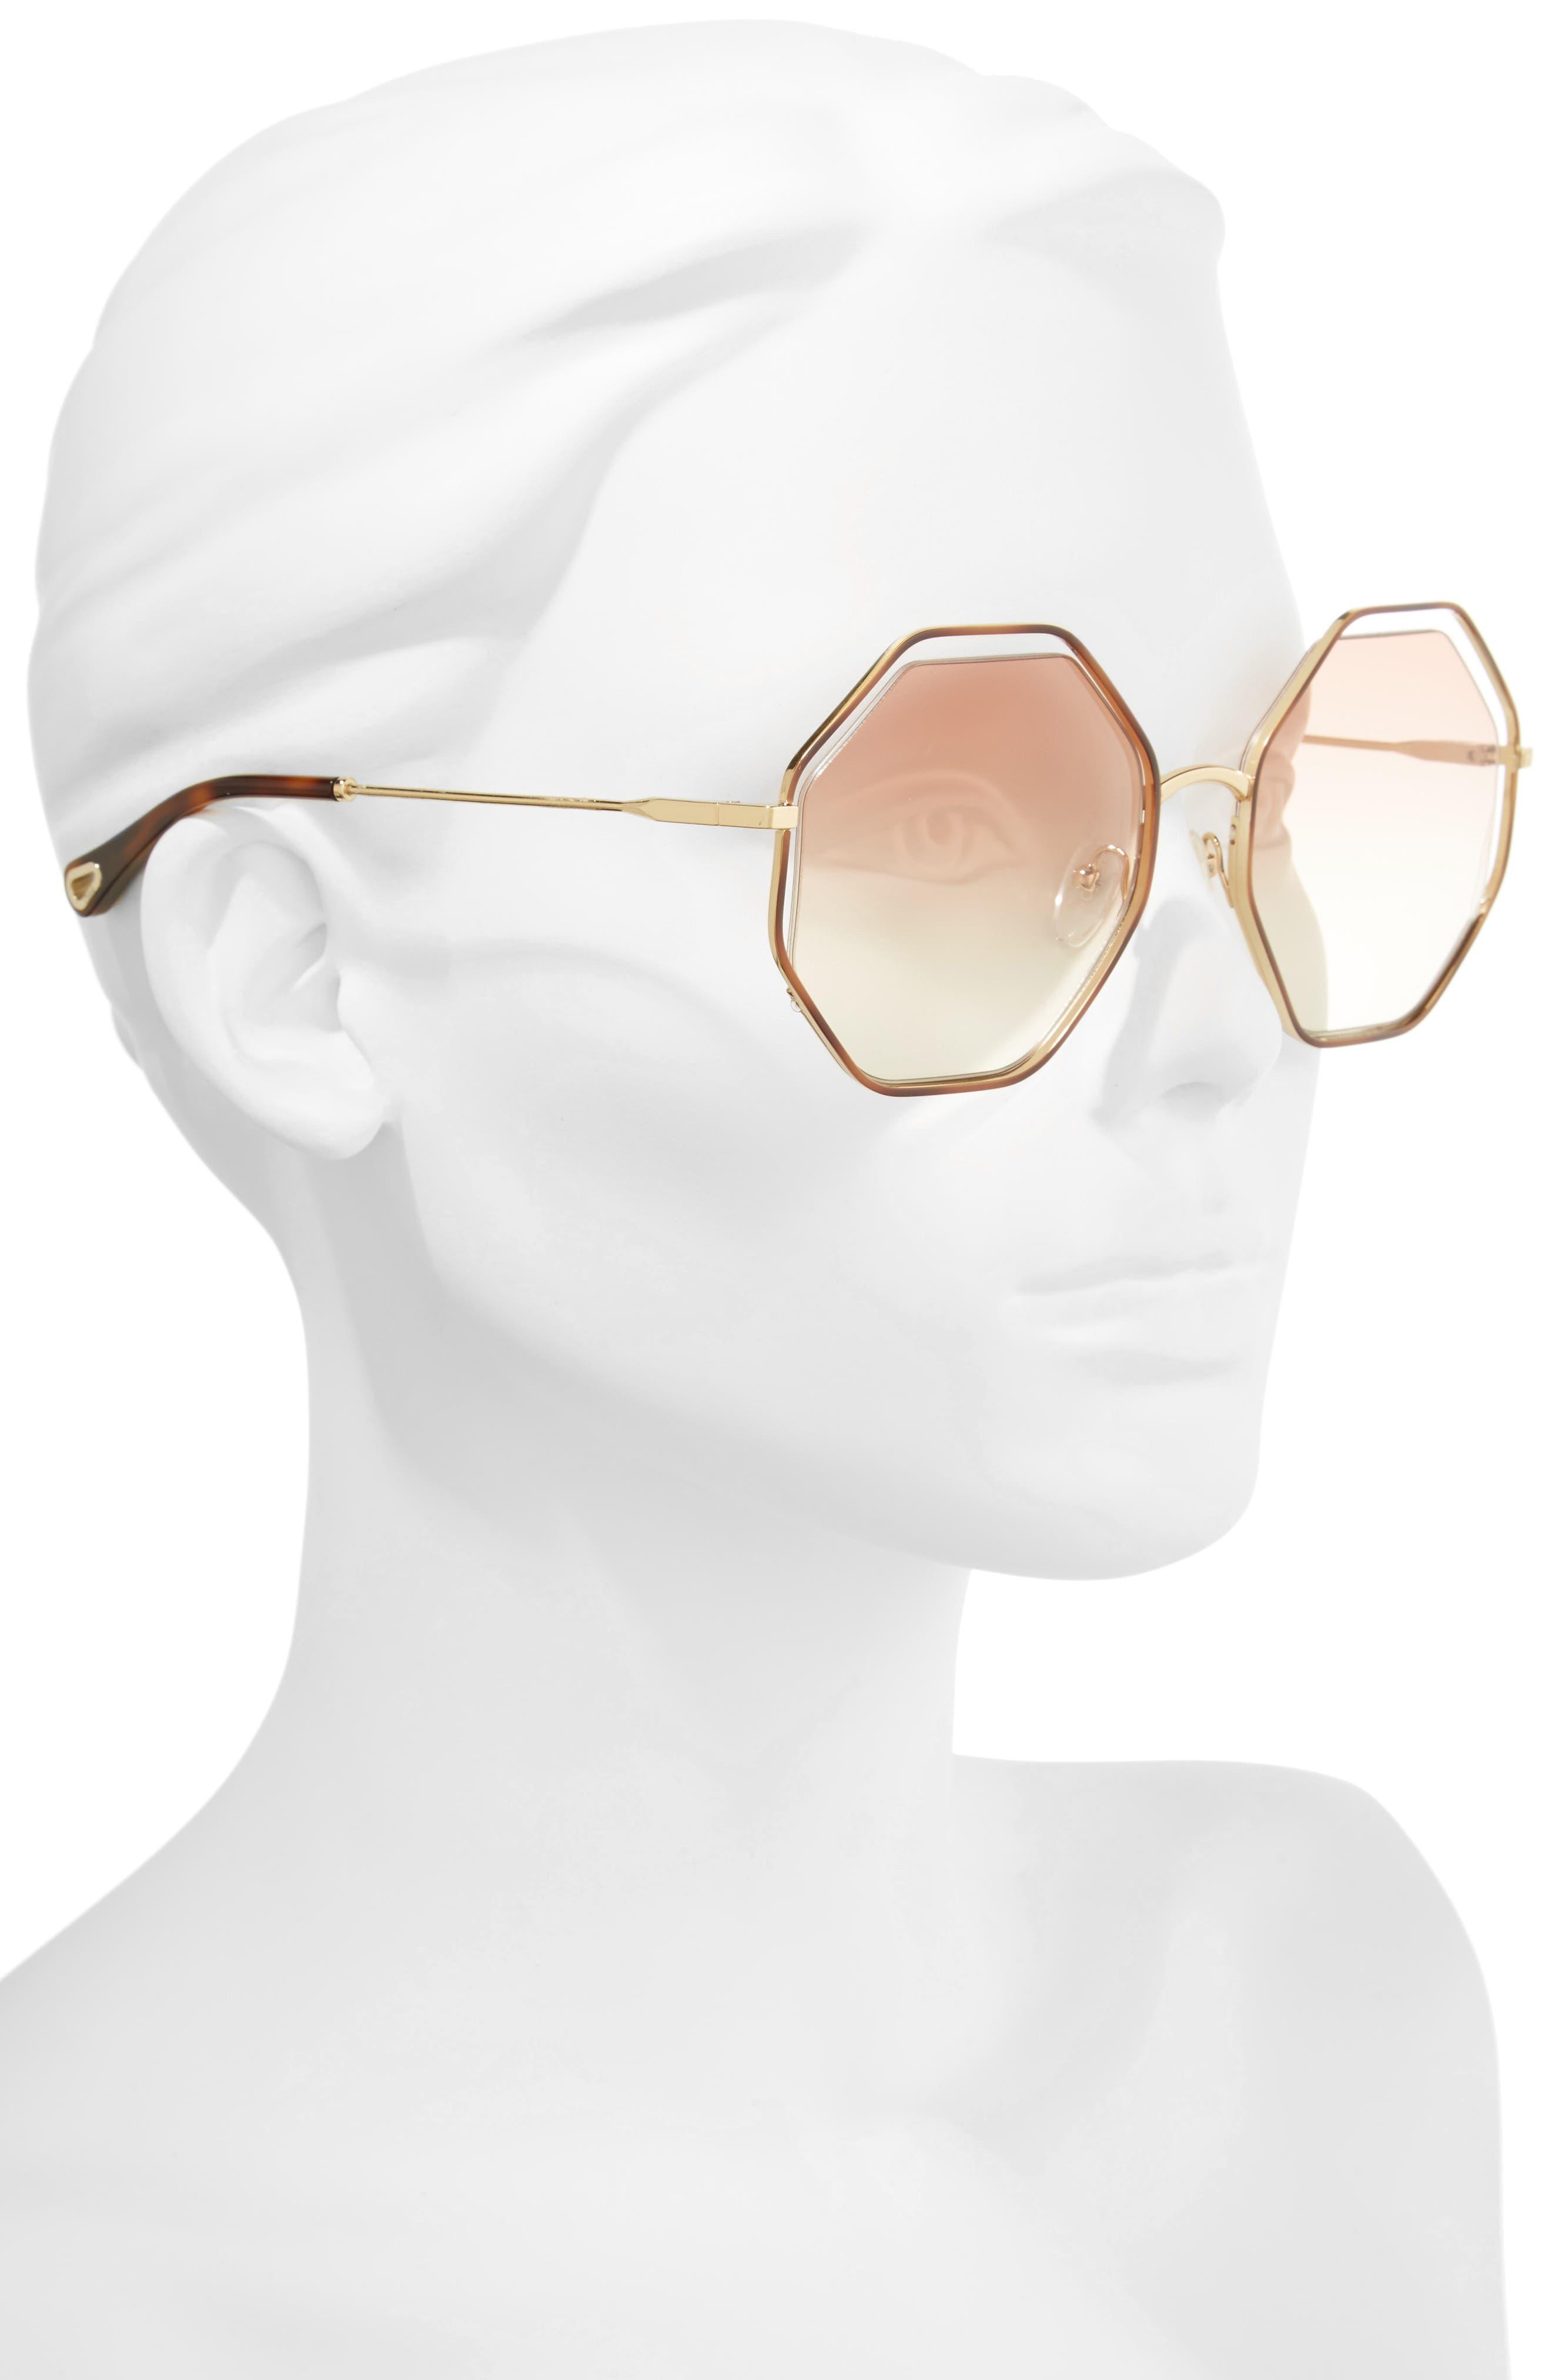 58mm Octagonal Halo Lens Sunglasses,                             Alternate thumbnail 2, color,                             HAVANA/ PEACH